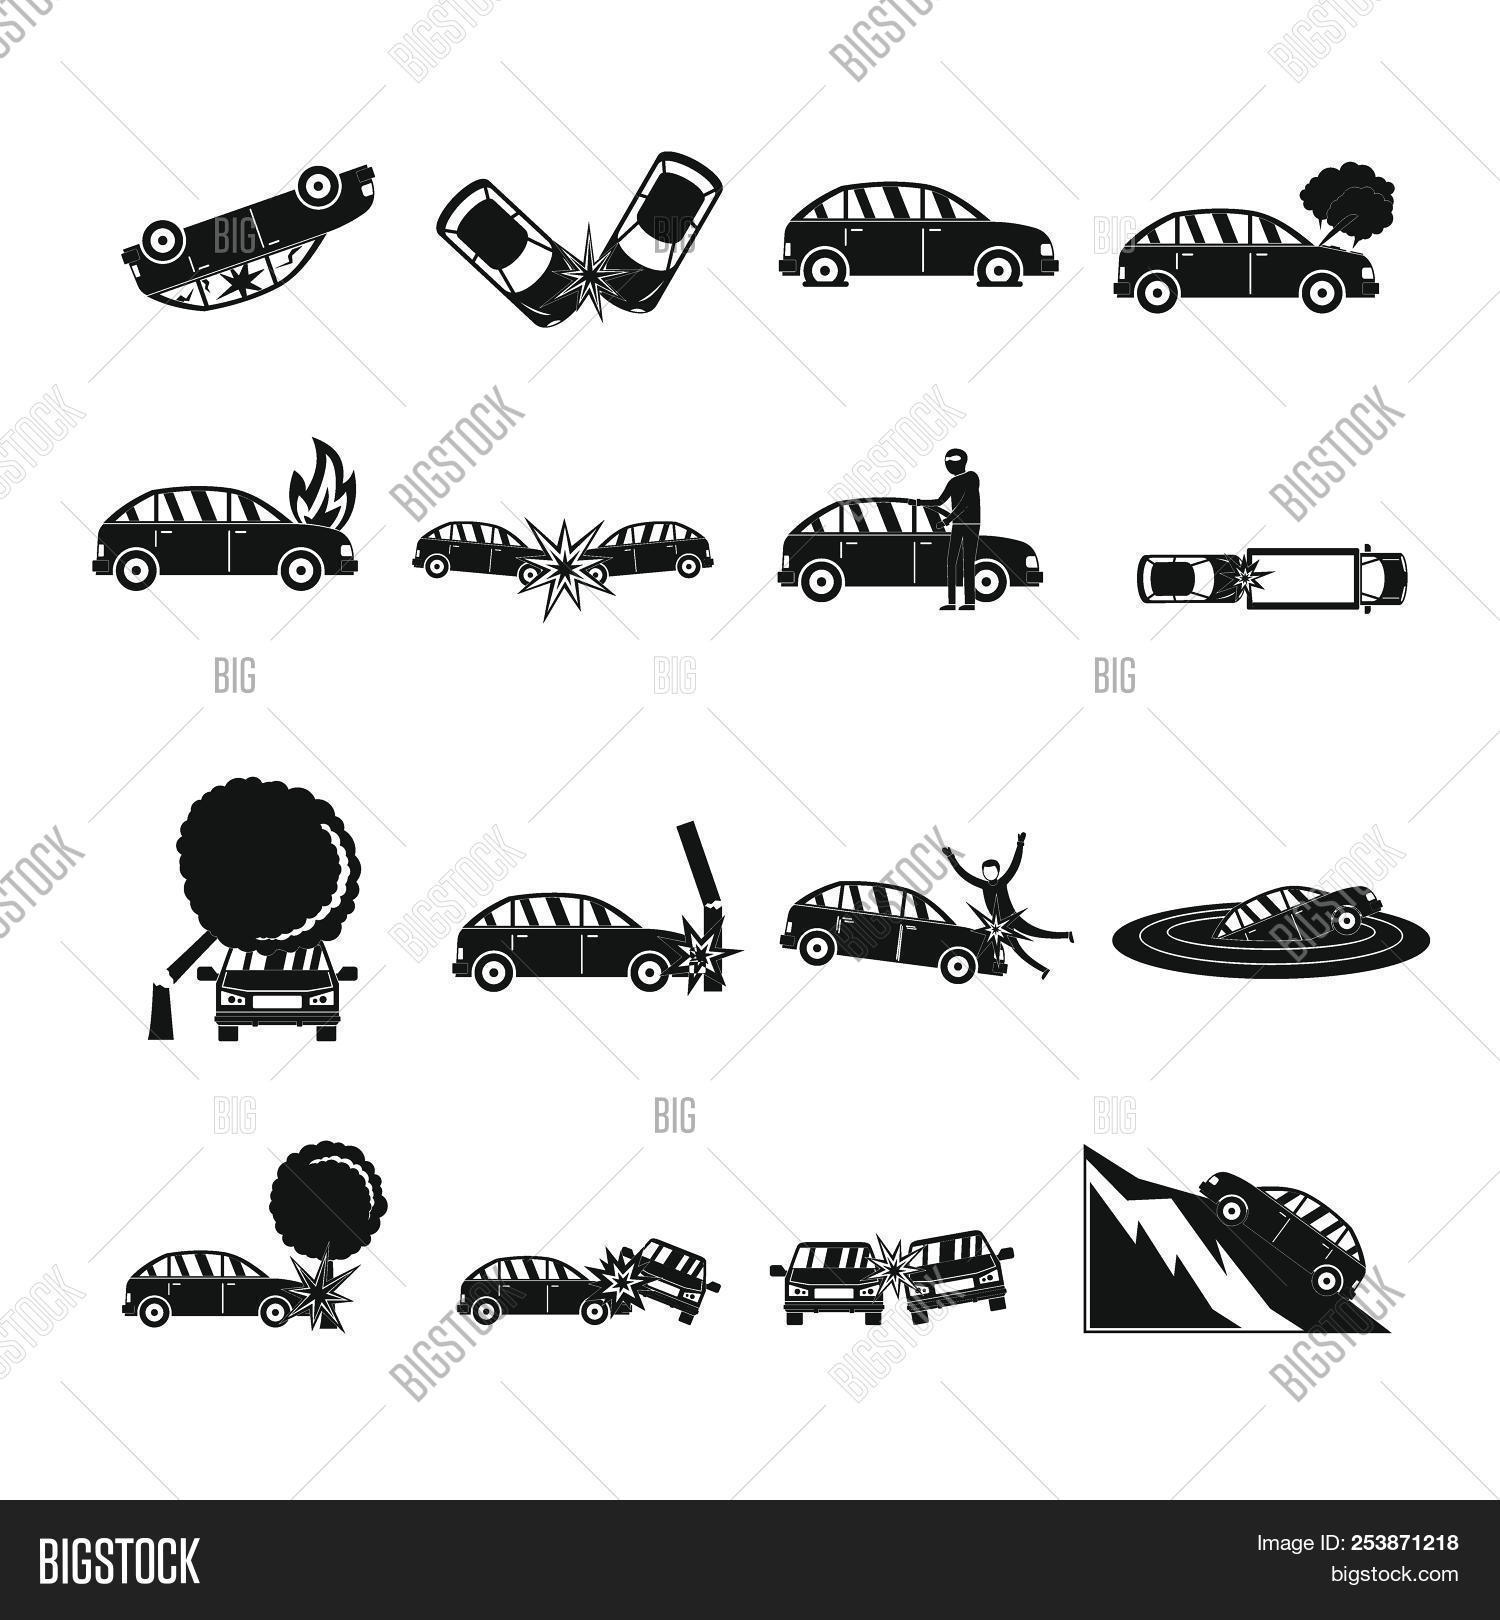 Accident Car Crash Case Icons Set Simple Illustration Of 16